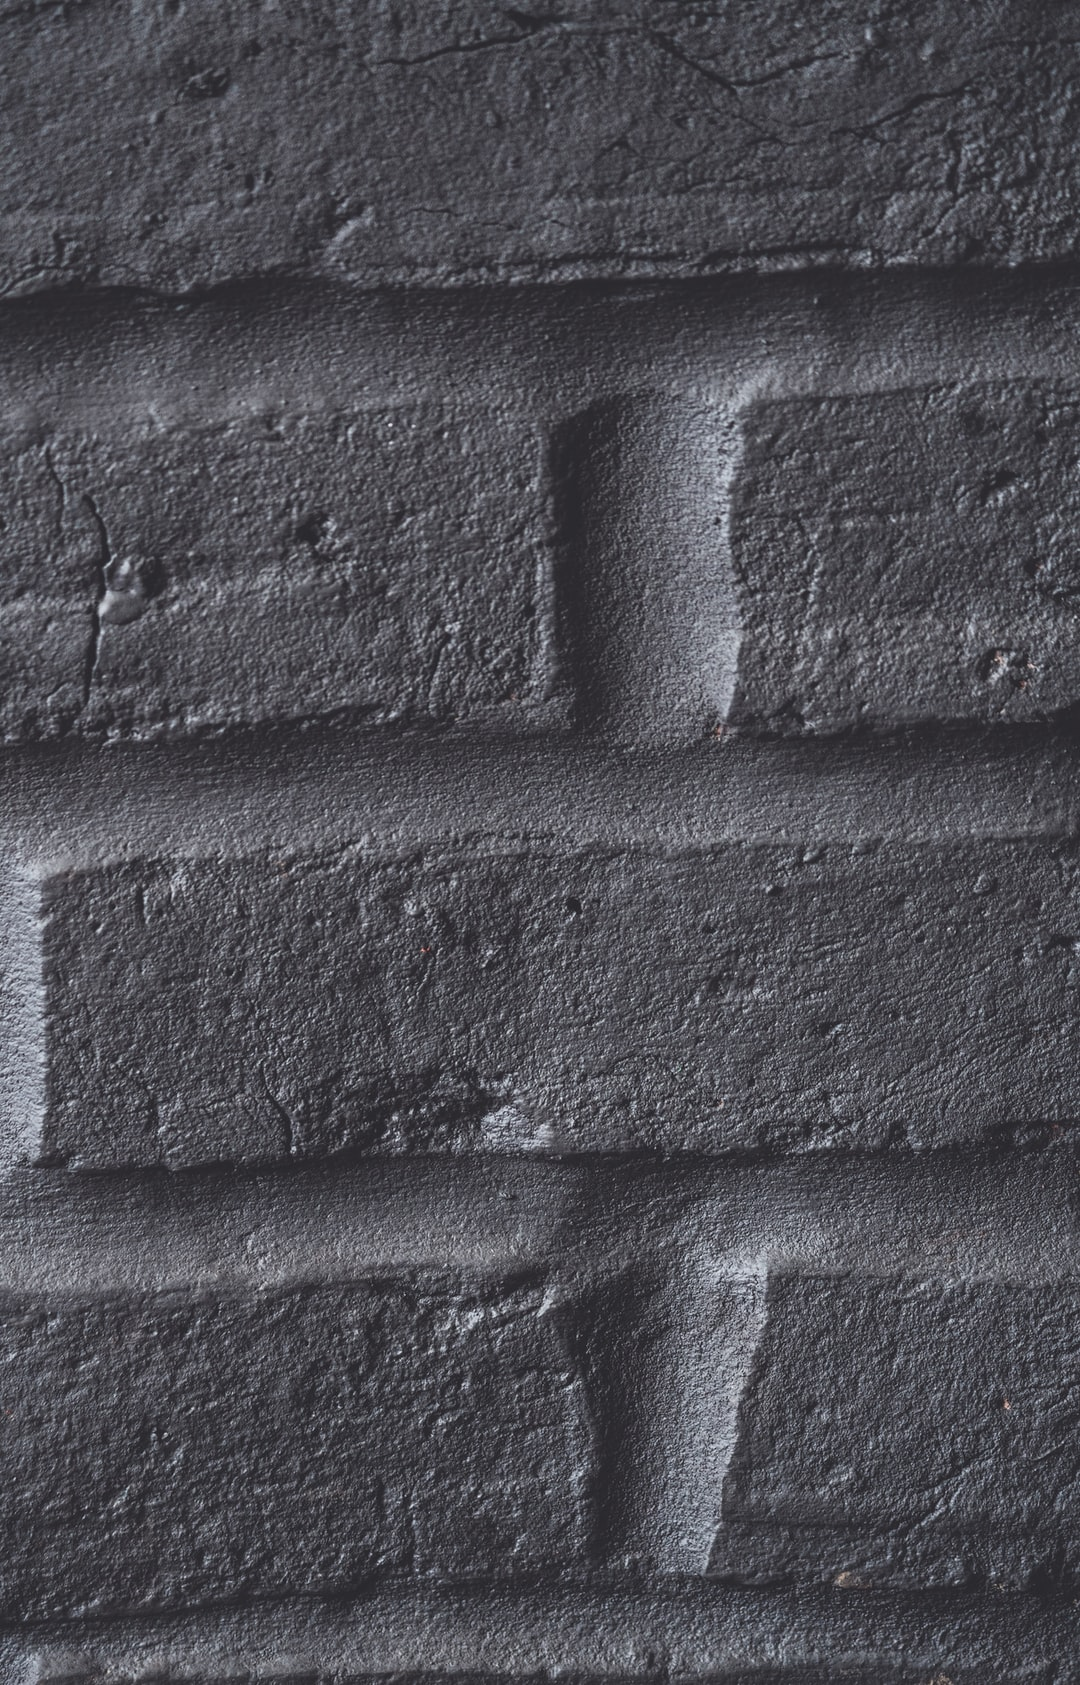 Dark gray brick wall texture background